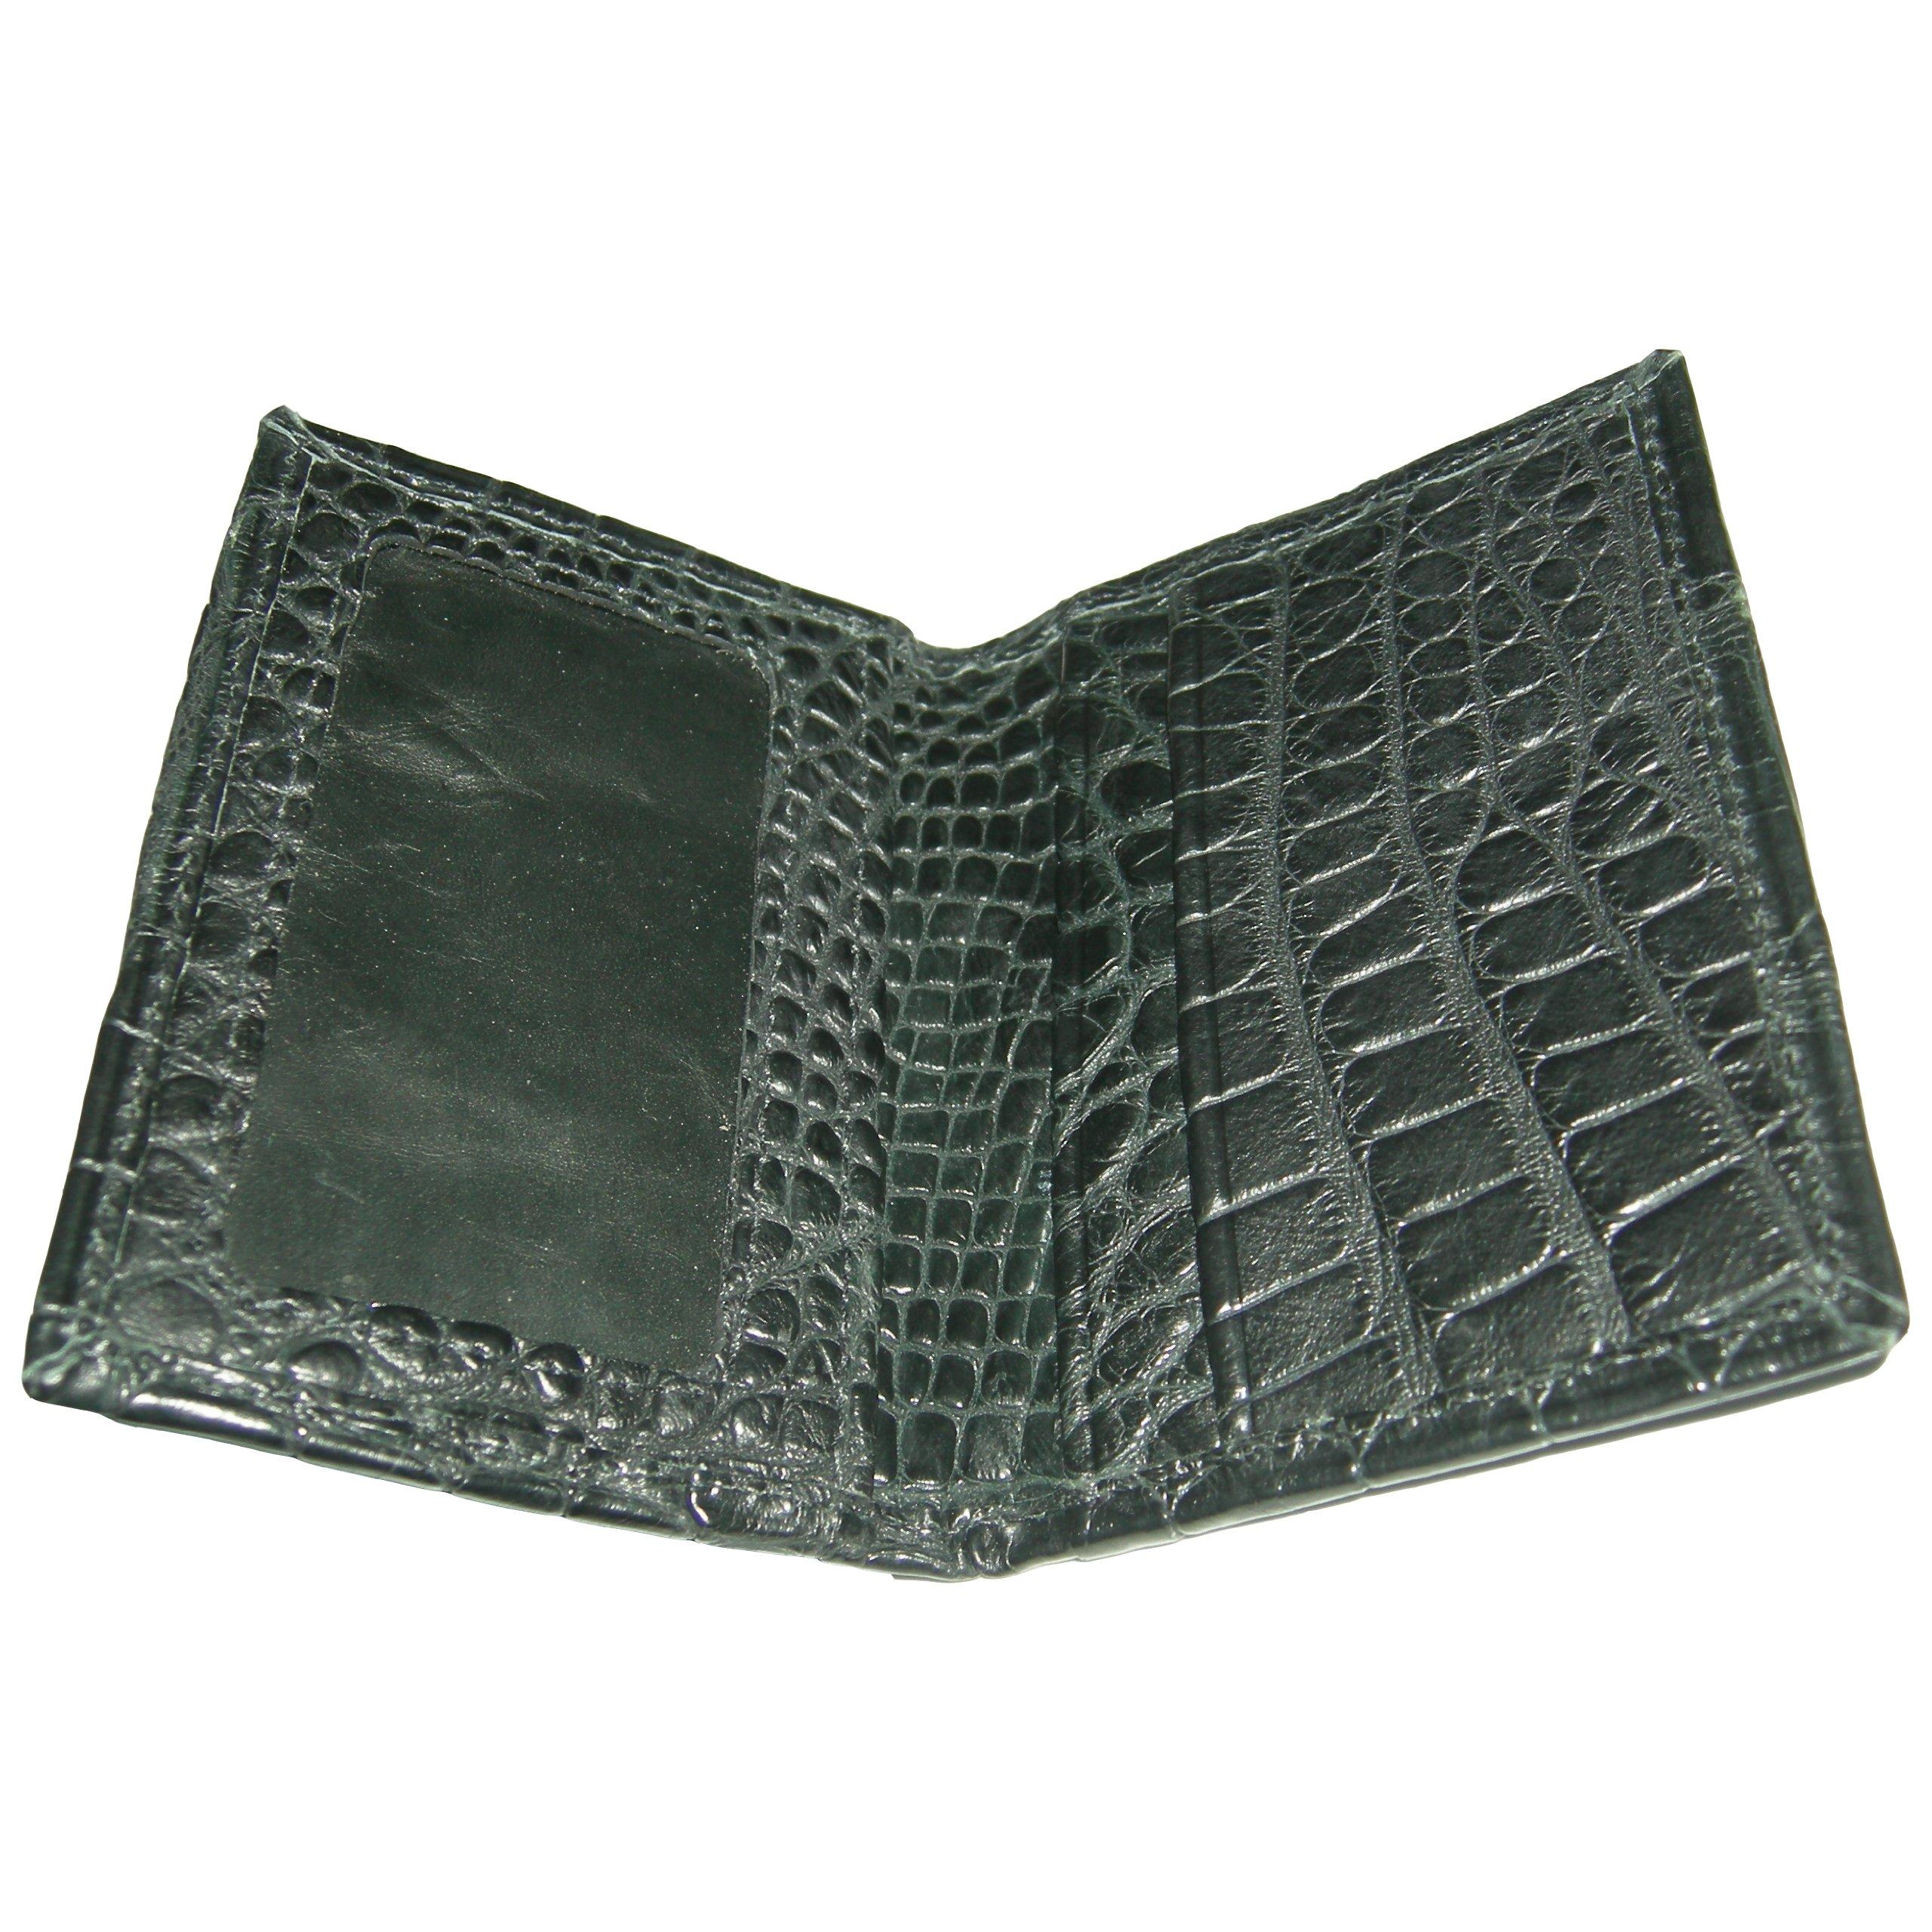 Sultan Genuine Alligator Men's Slim ID Bifold Wallet - Black Safari (Semi-Gloss) - One Size